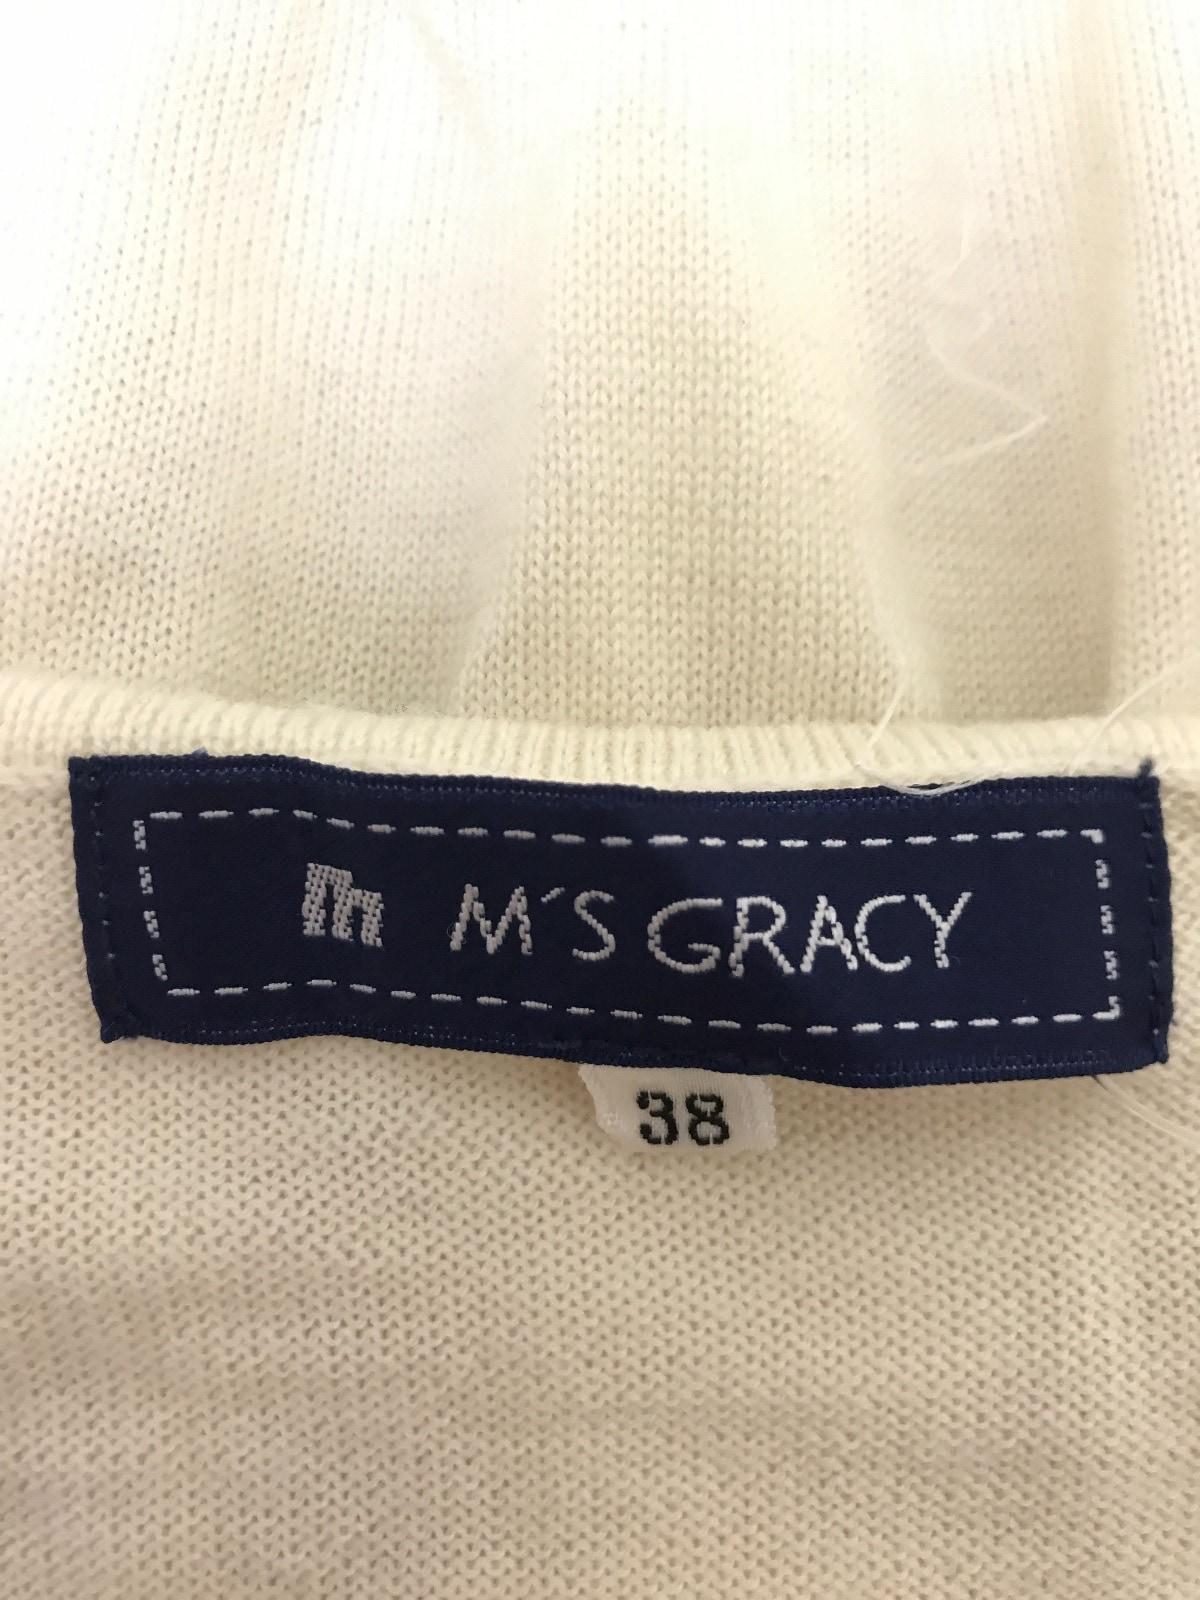 M'S GRACY(エムズグレイシー)のカーディガン